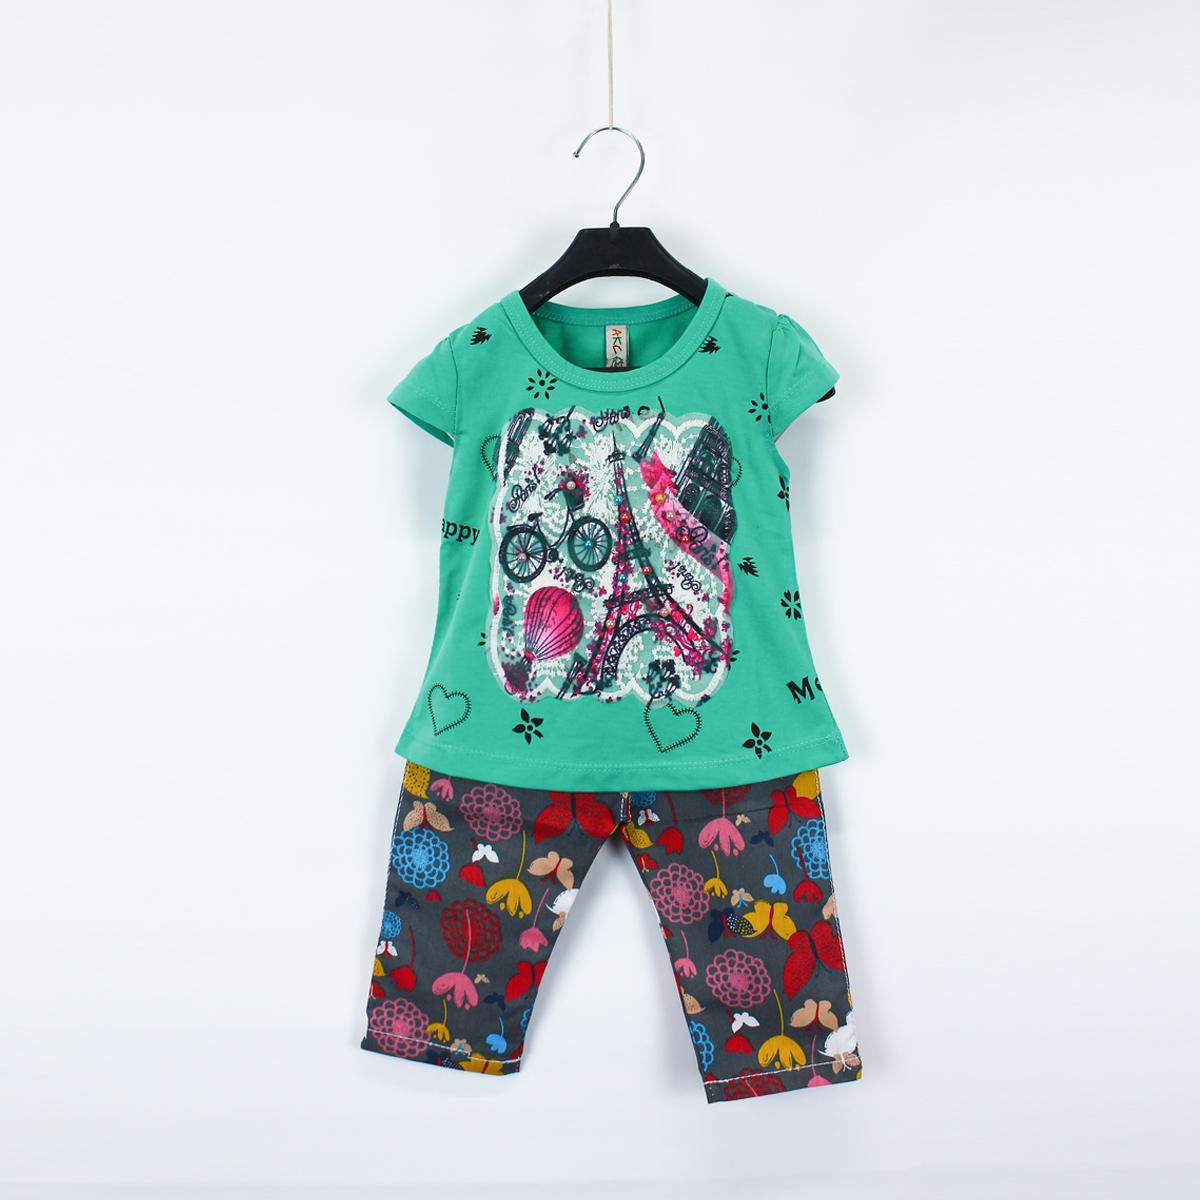 Cut Price Newborn Baby Suit 3 Mth - 9 Mth Net Embroidery PARIS